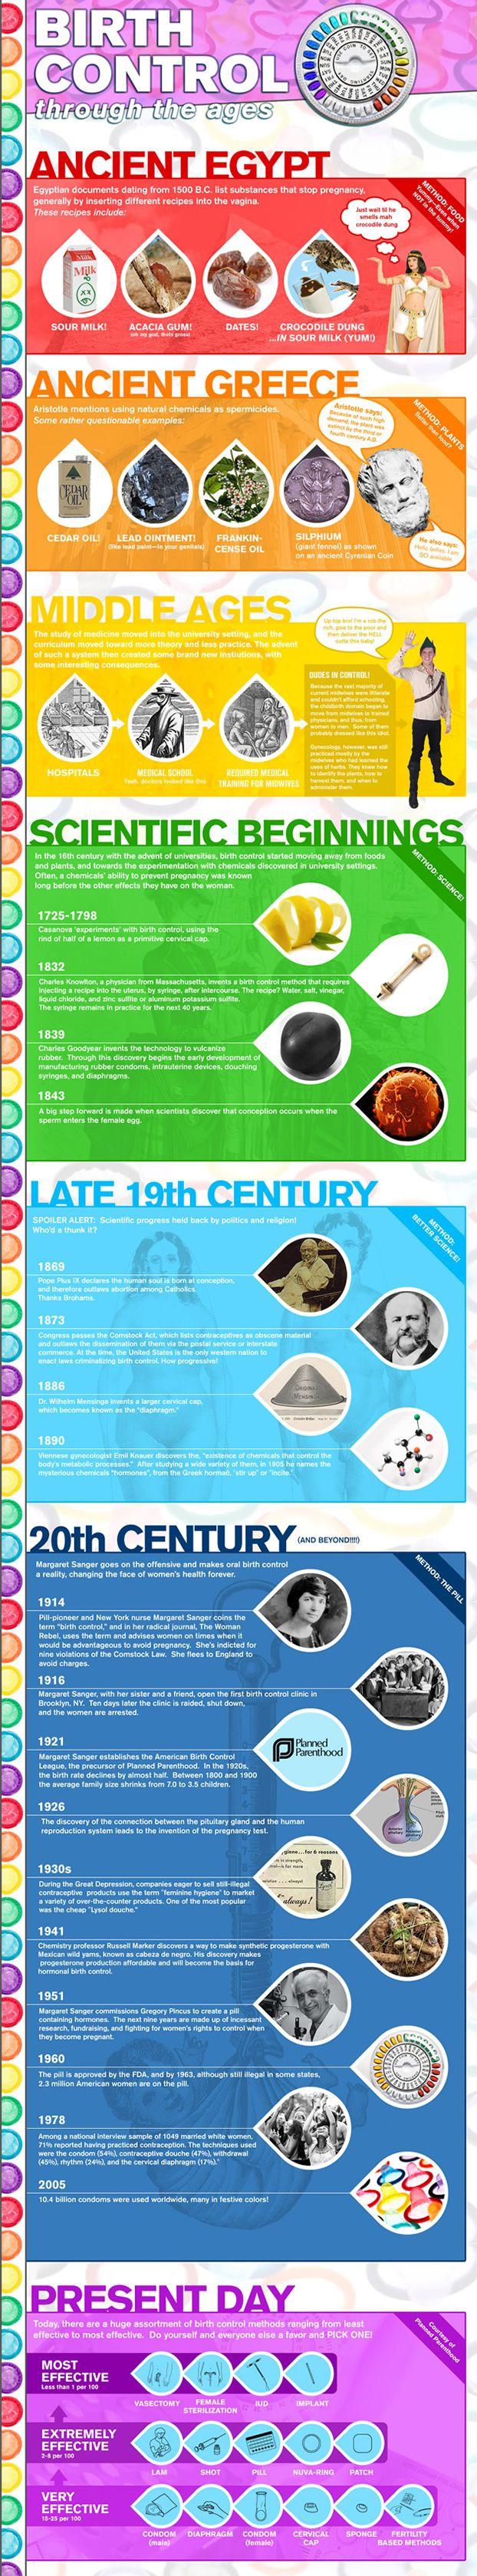 Birth Control Infographic Birth Control Medical History Contraception